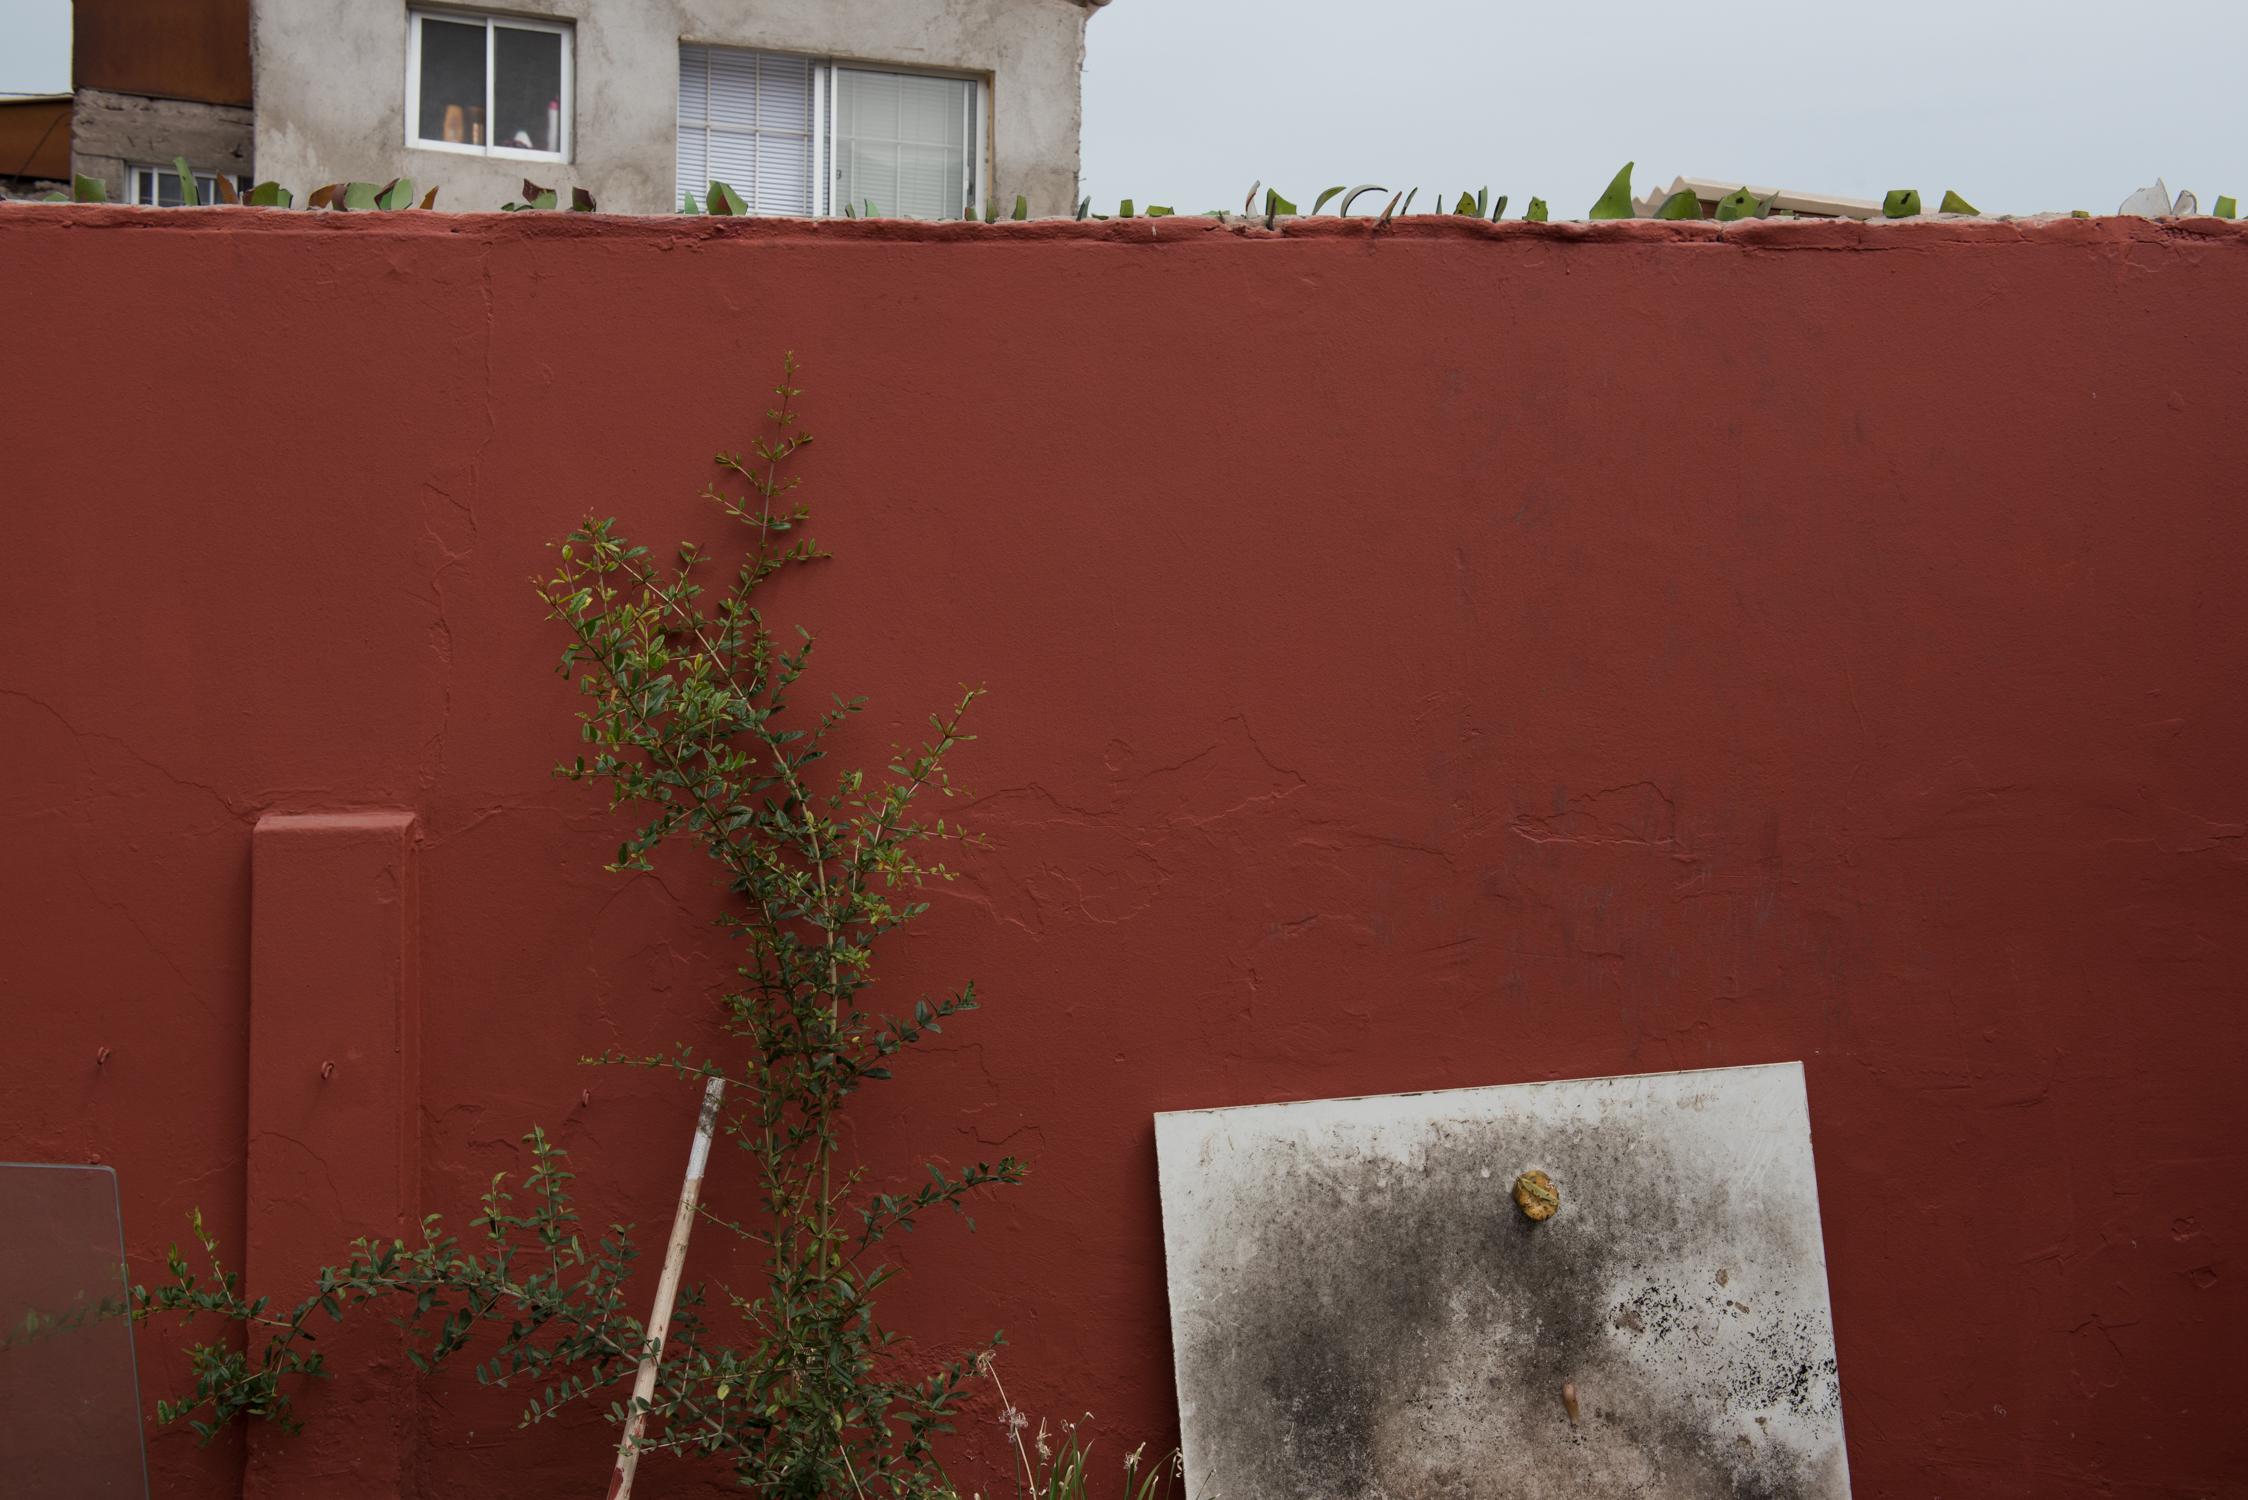 Muro del desaliento uno. (Discouragement wall one)Iquique, Tar